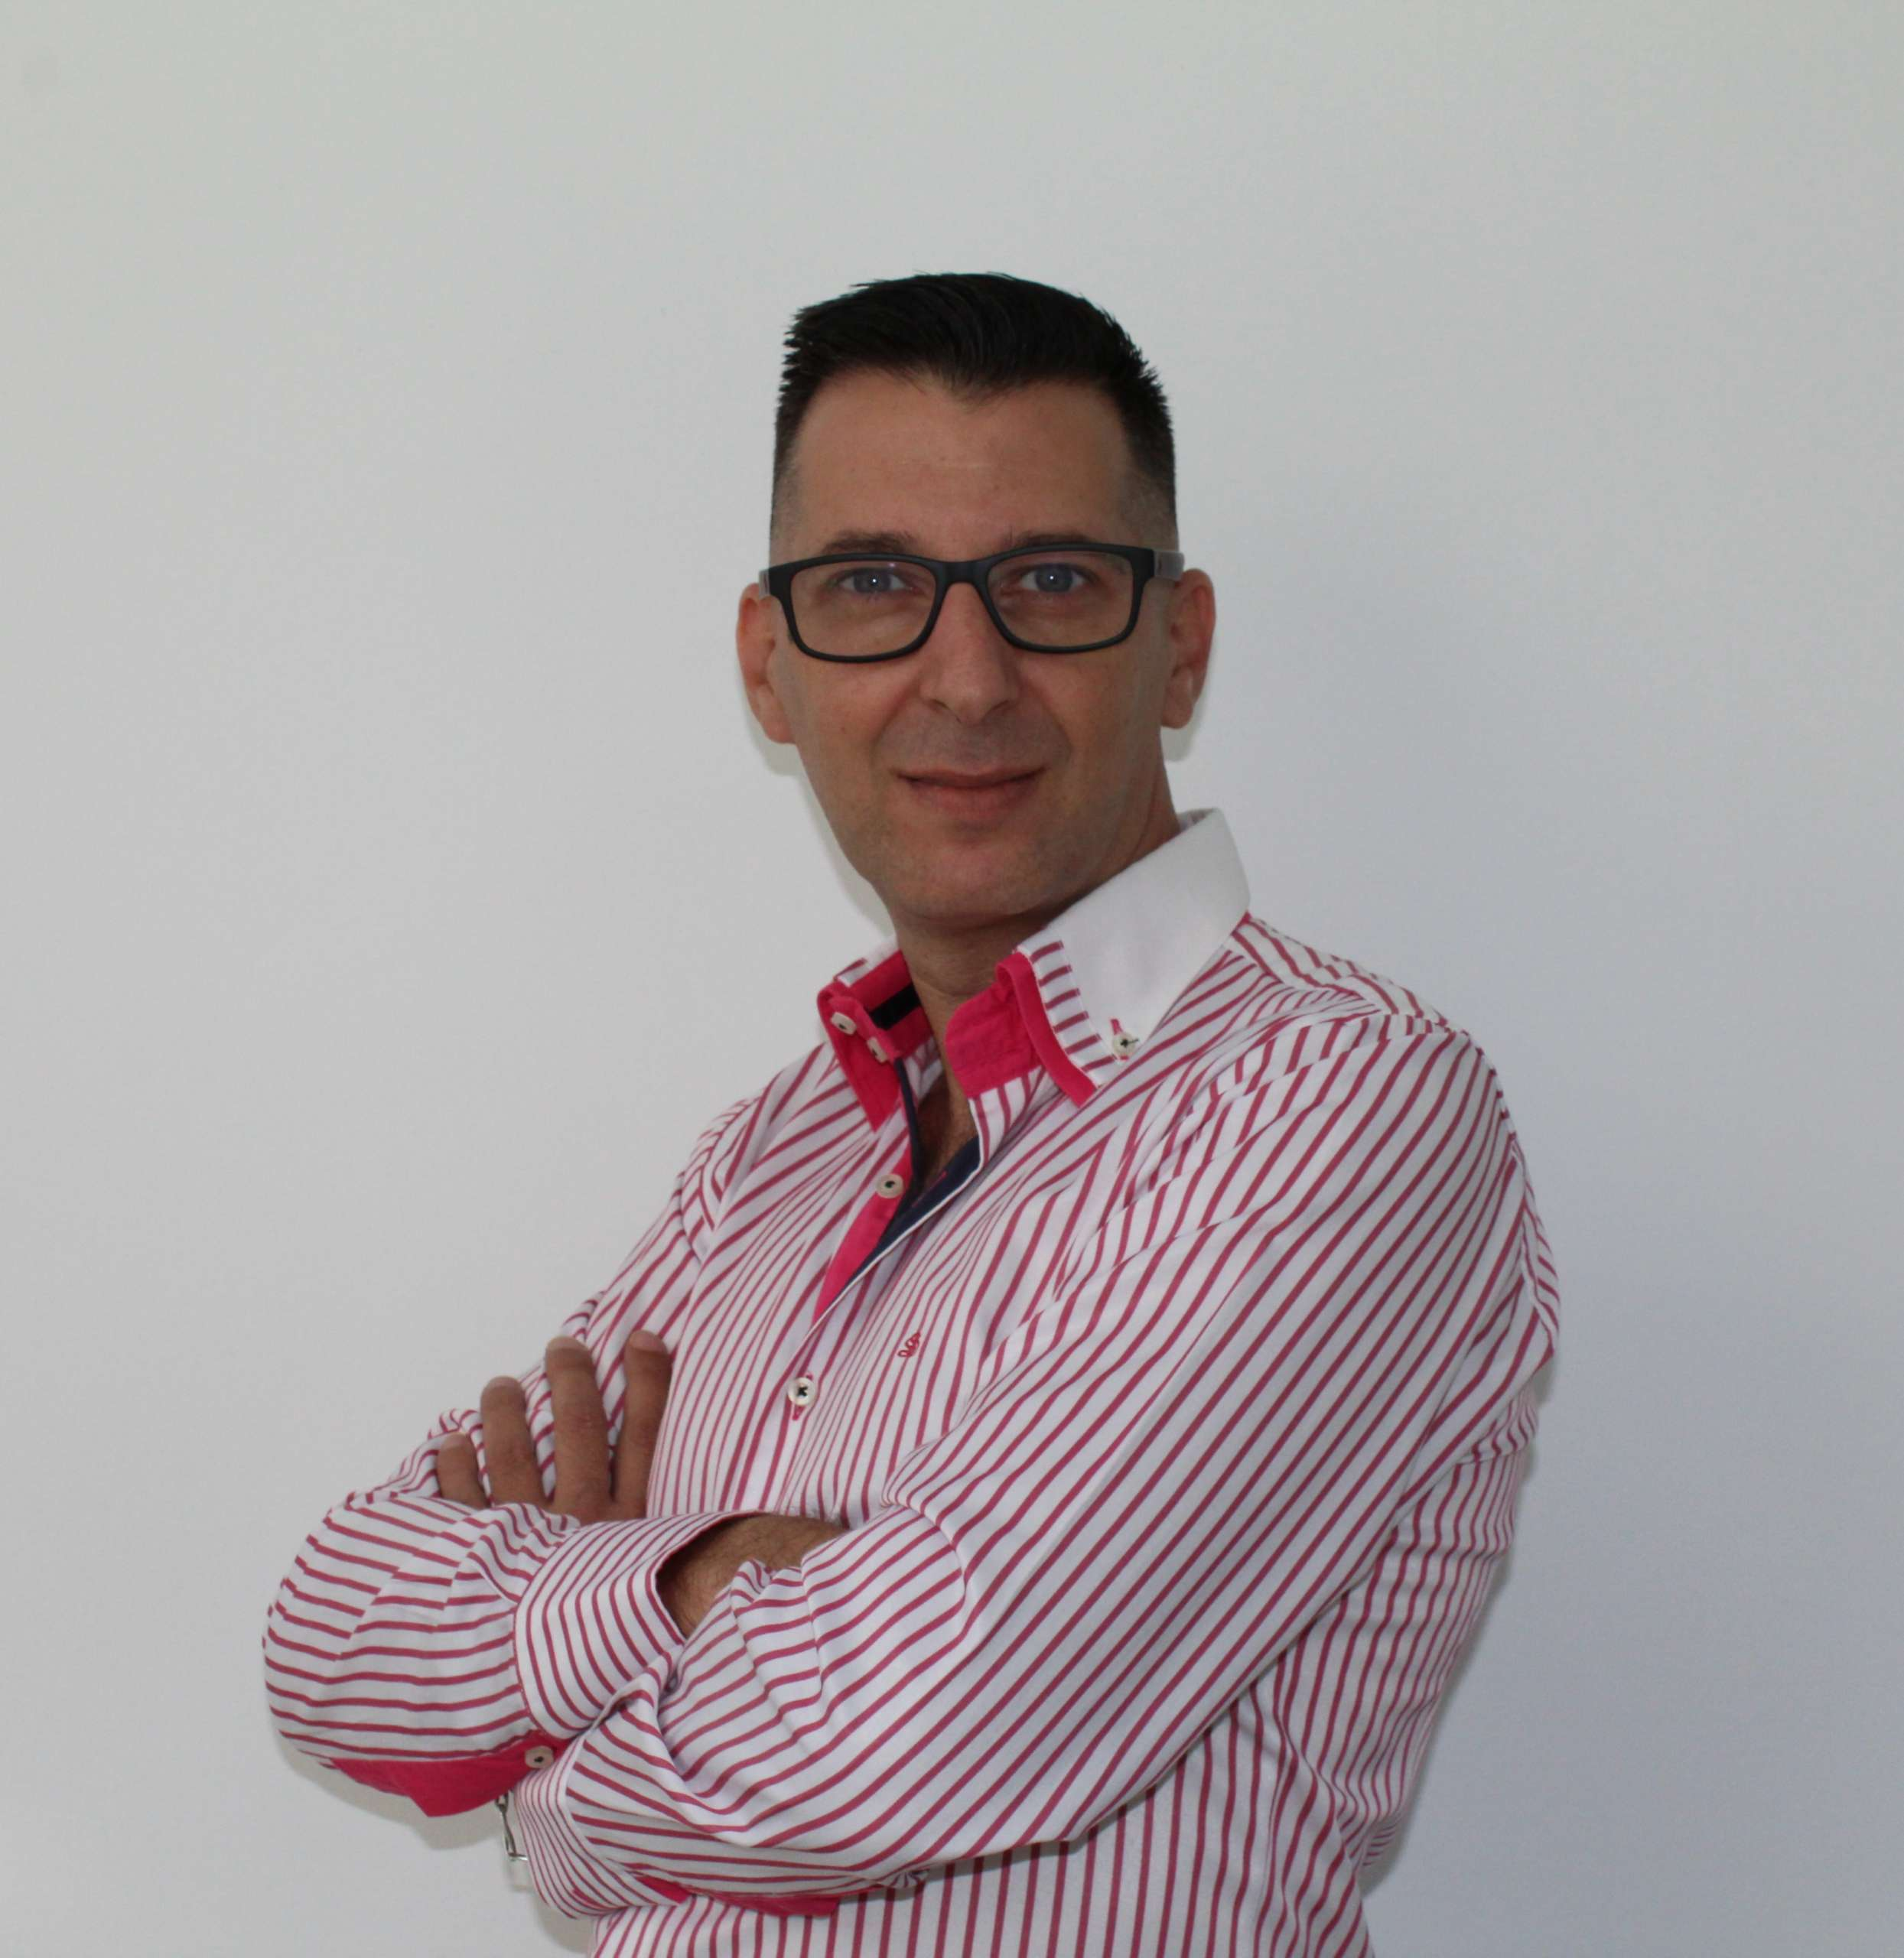 Olivier Moreno